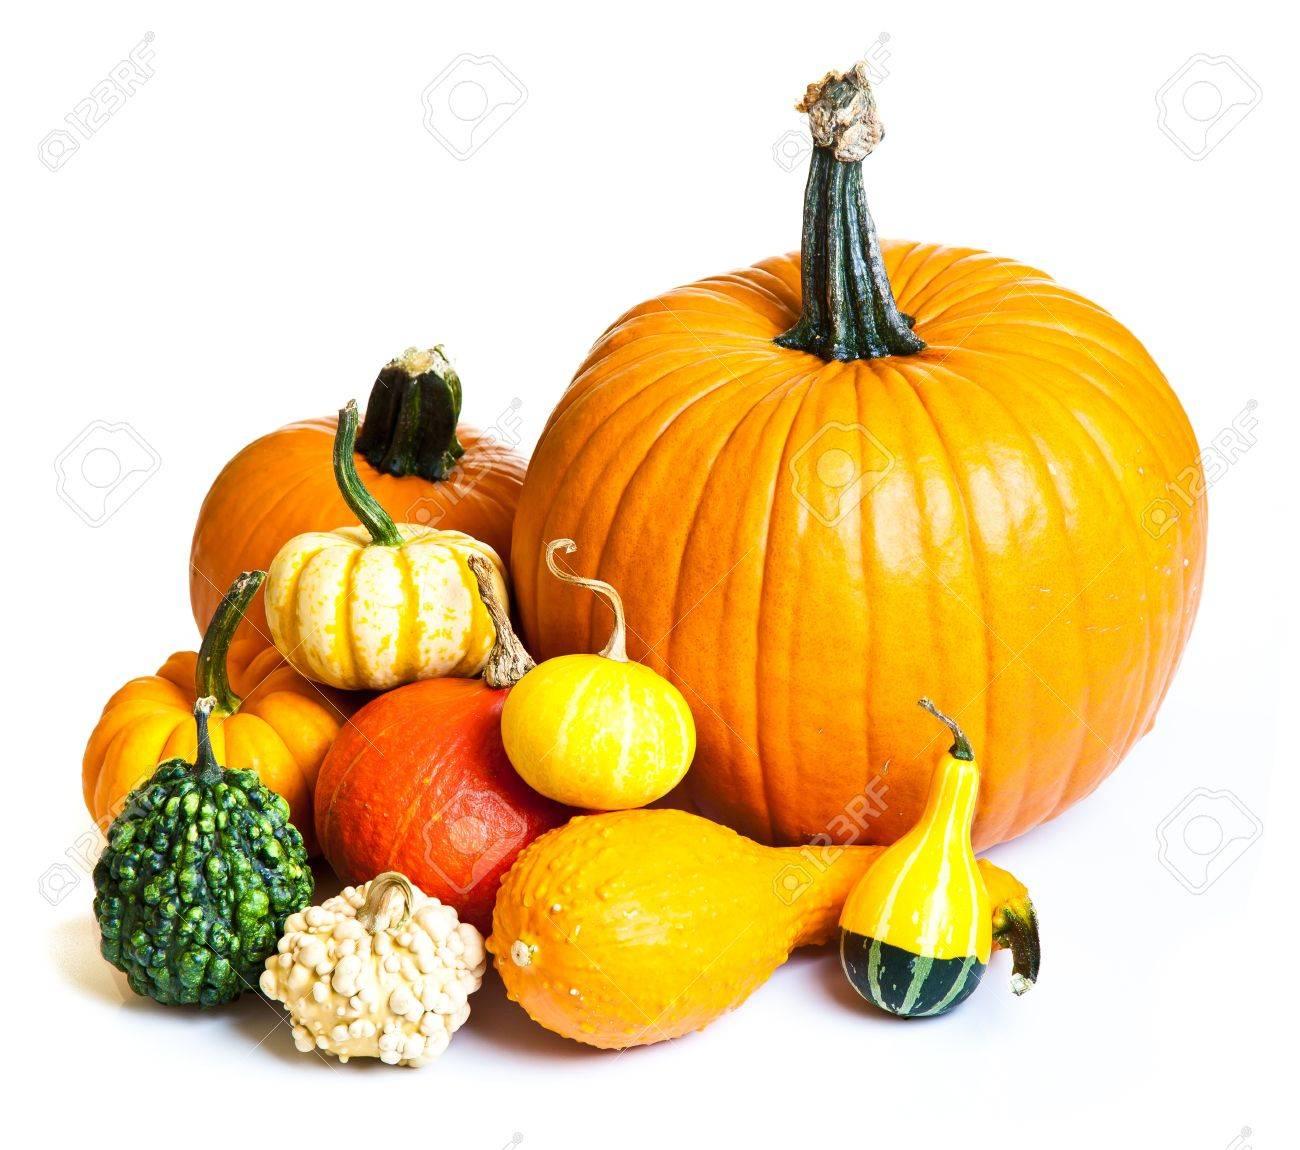 Ripe pumpkin fruits isolated on white Stock Photo - 10546559